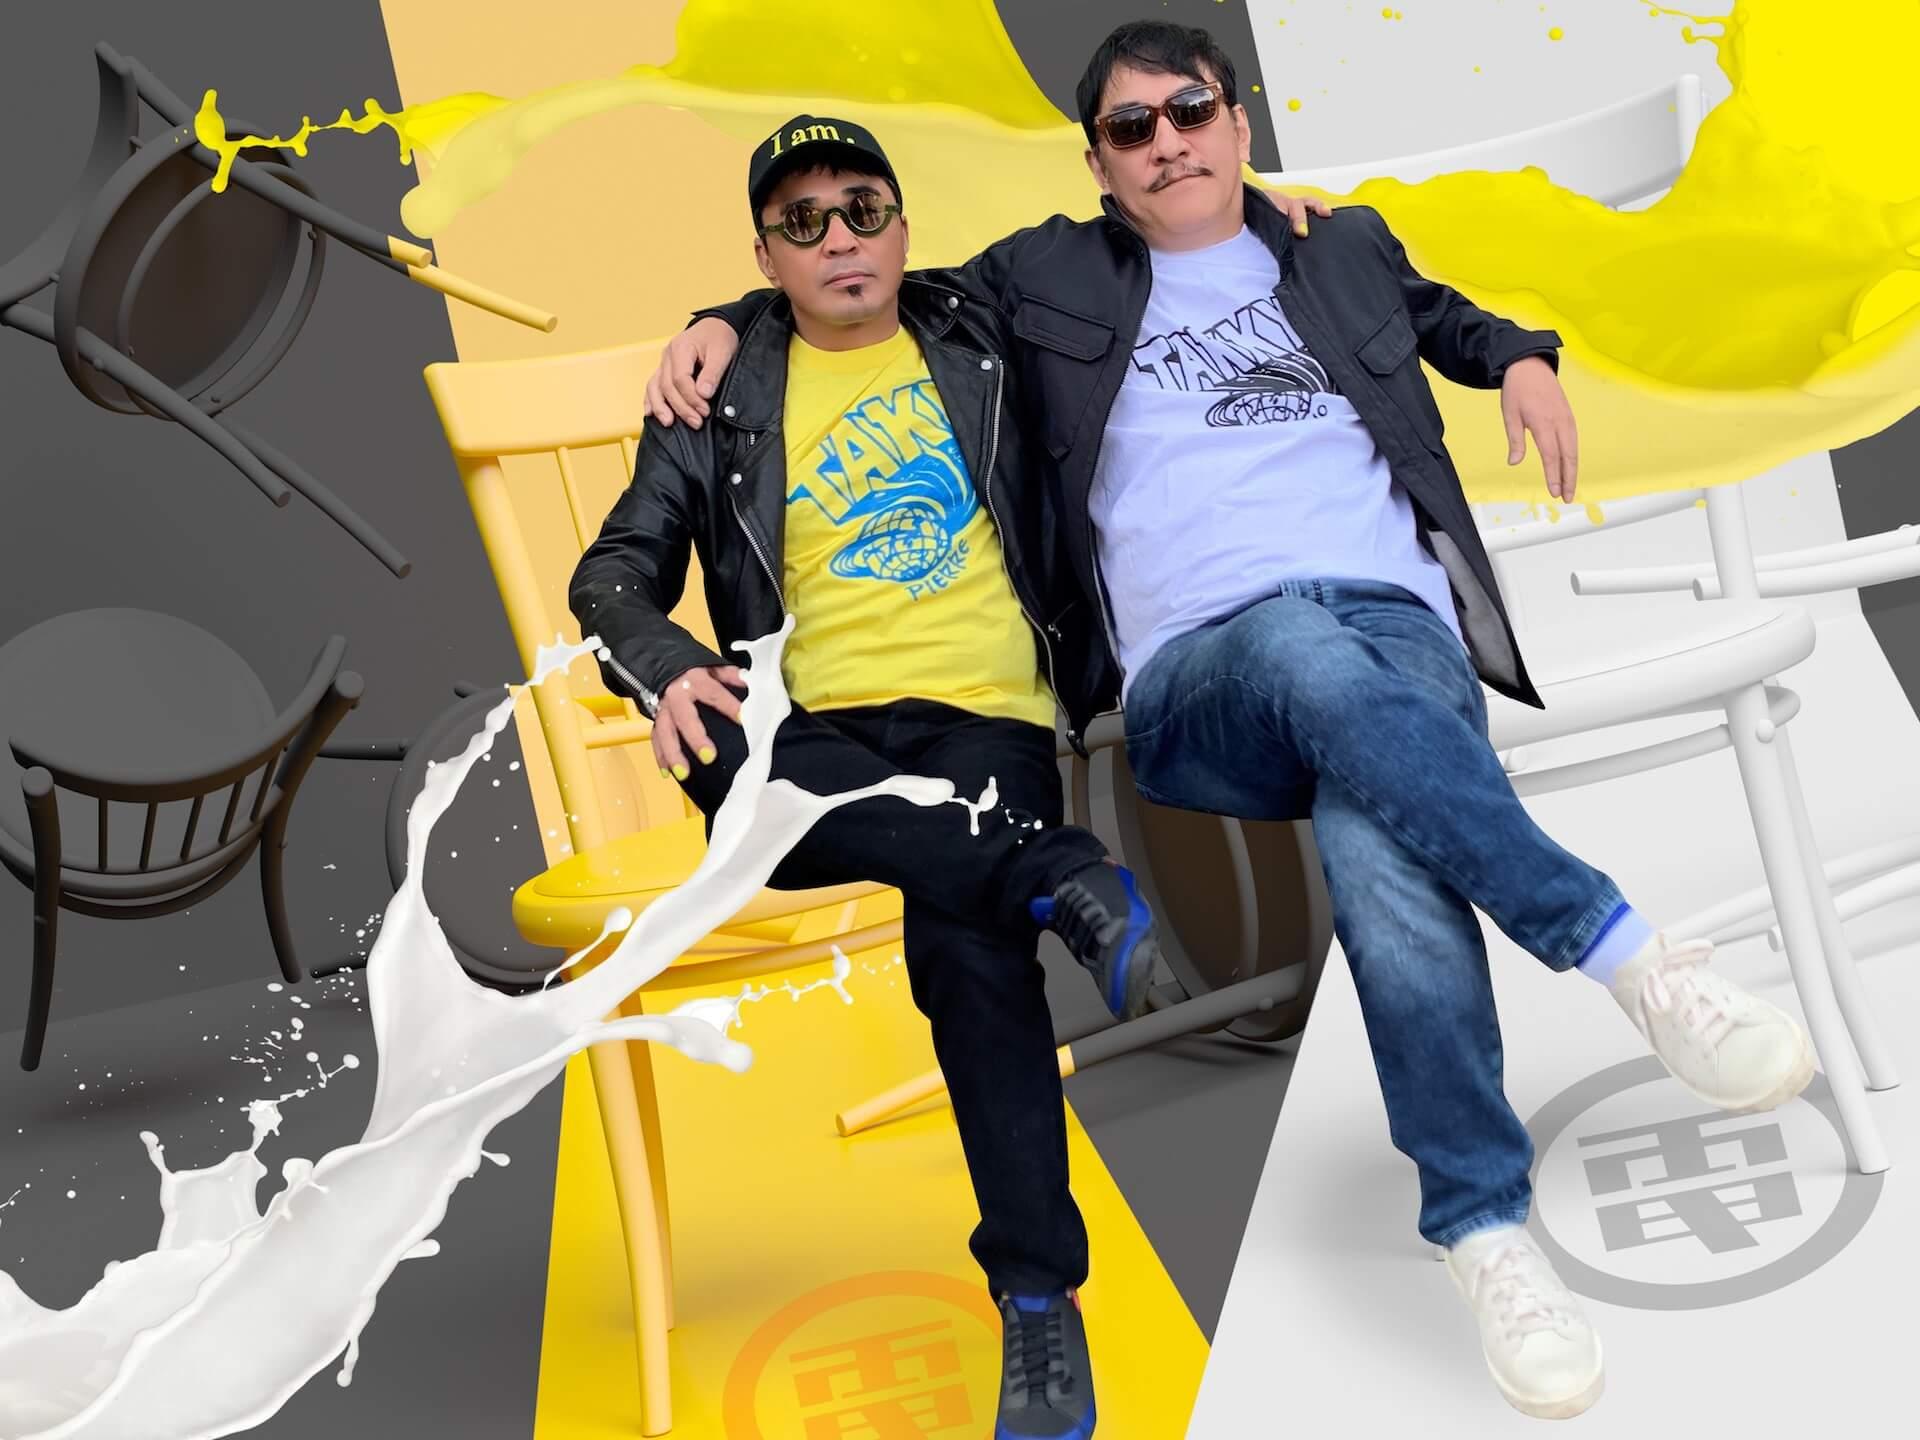 〈We will meet again〉──LIQUIDROOMが電気グルーヴ、坂本慎太郎とのコラボTシャツを受注販売開始 music200501-liquidroom-1-1